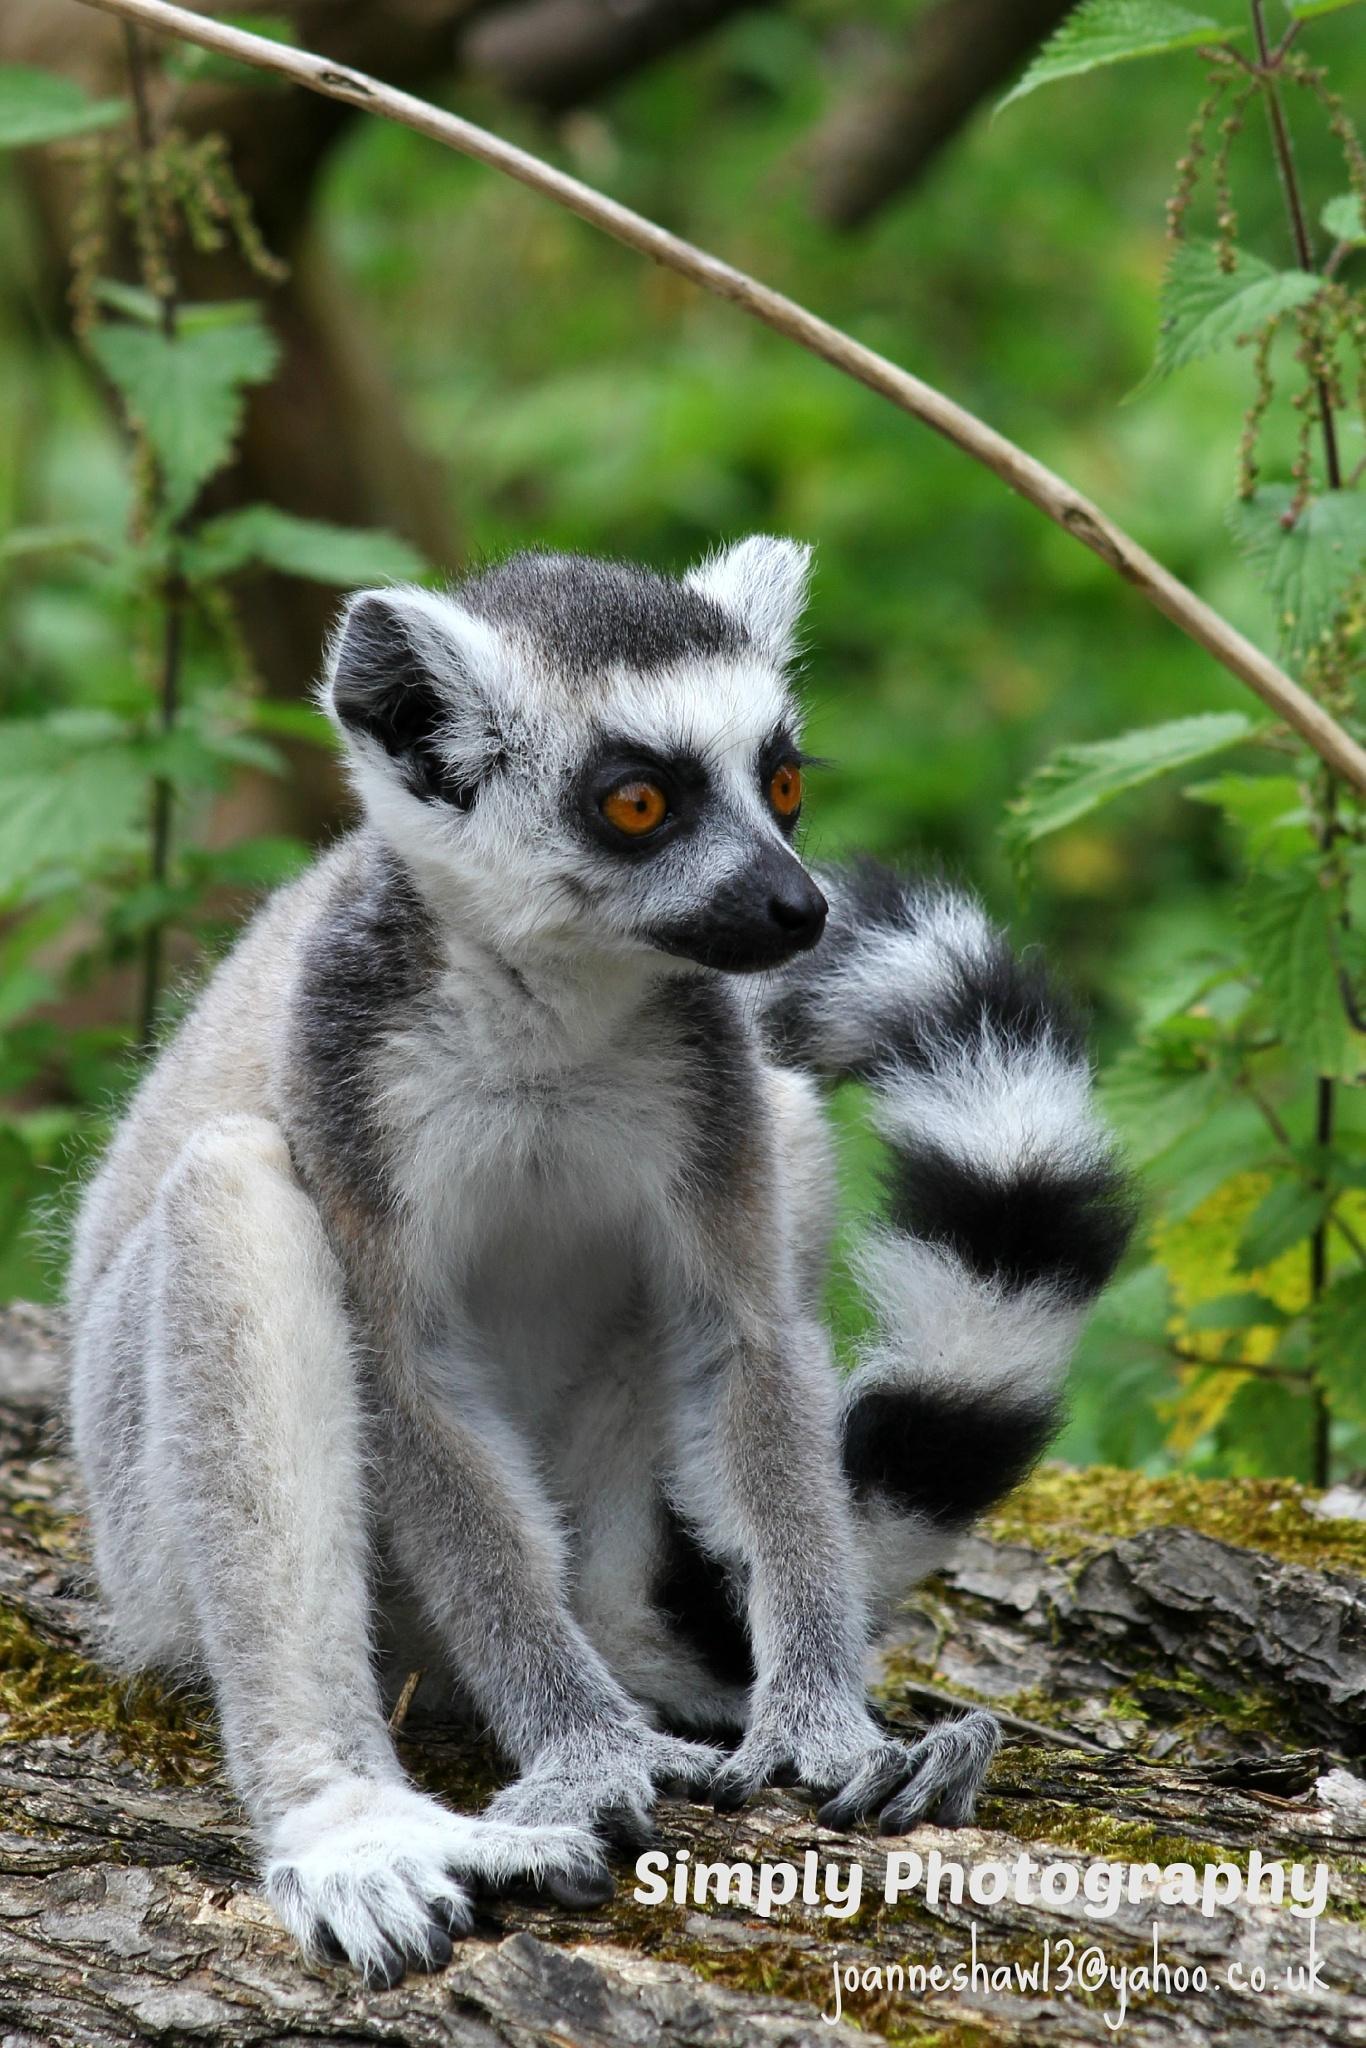 Ring-tailed Lemur (Lemur catta) by Joanne Laws